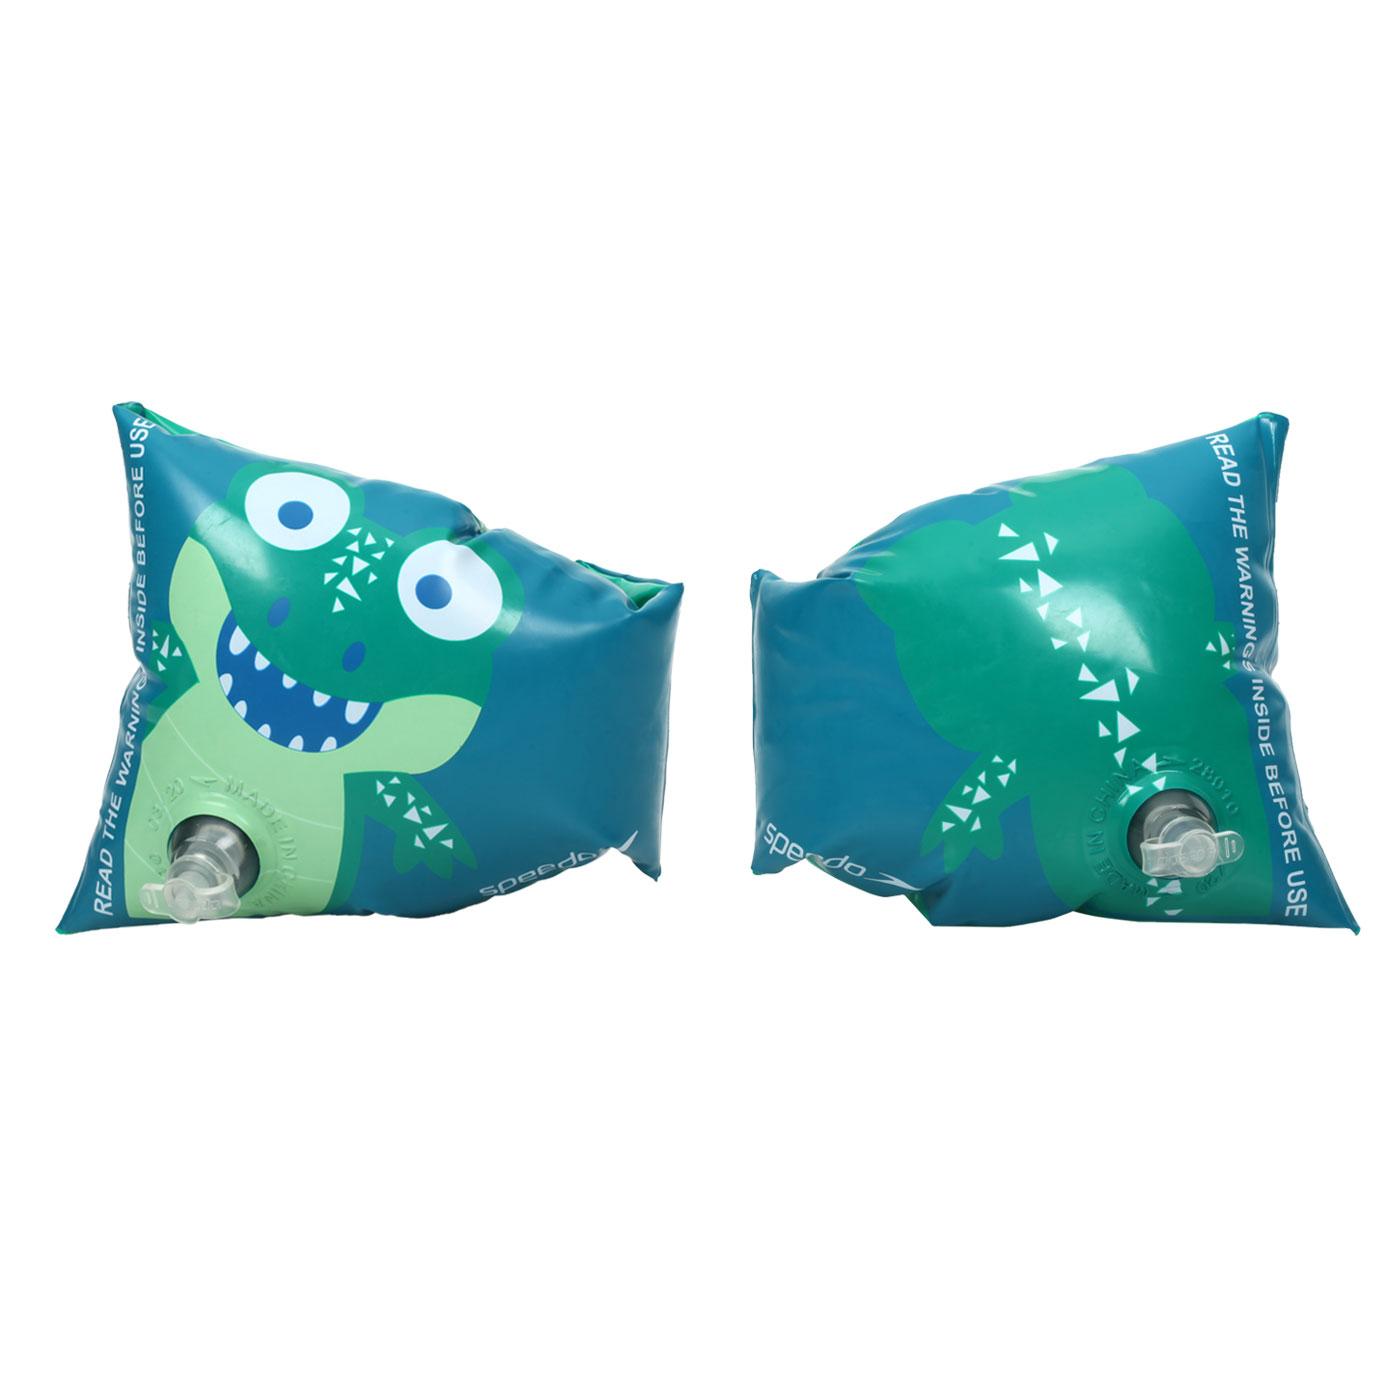 SPEEDO 兒童浮臂-小鱷魚 SD811734D680 - 藍綠